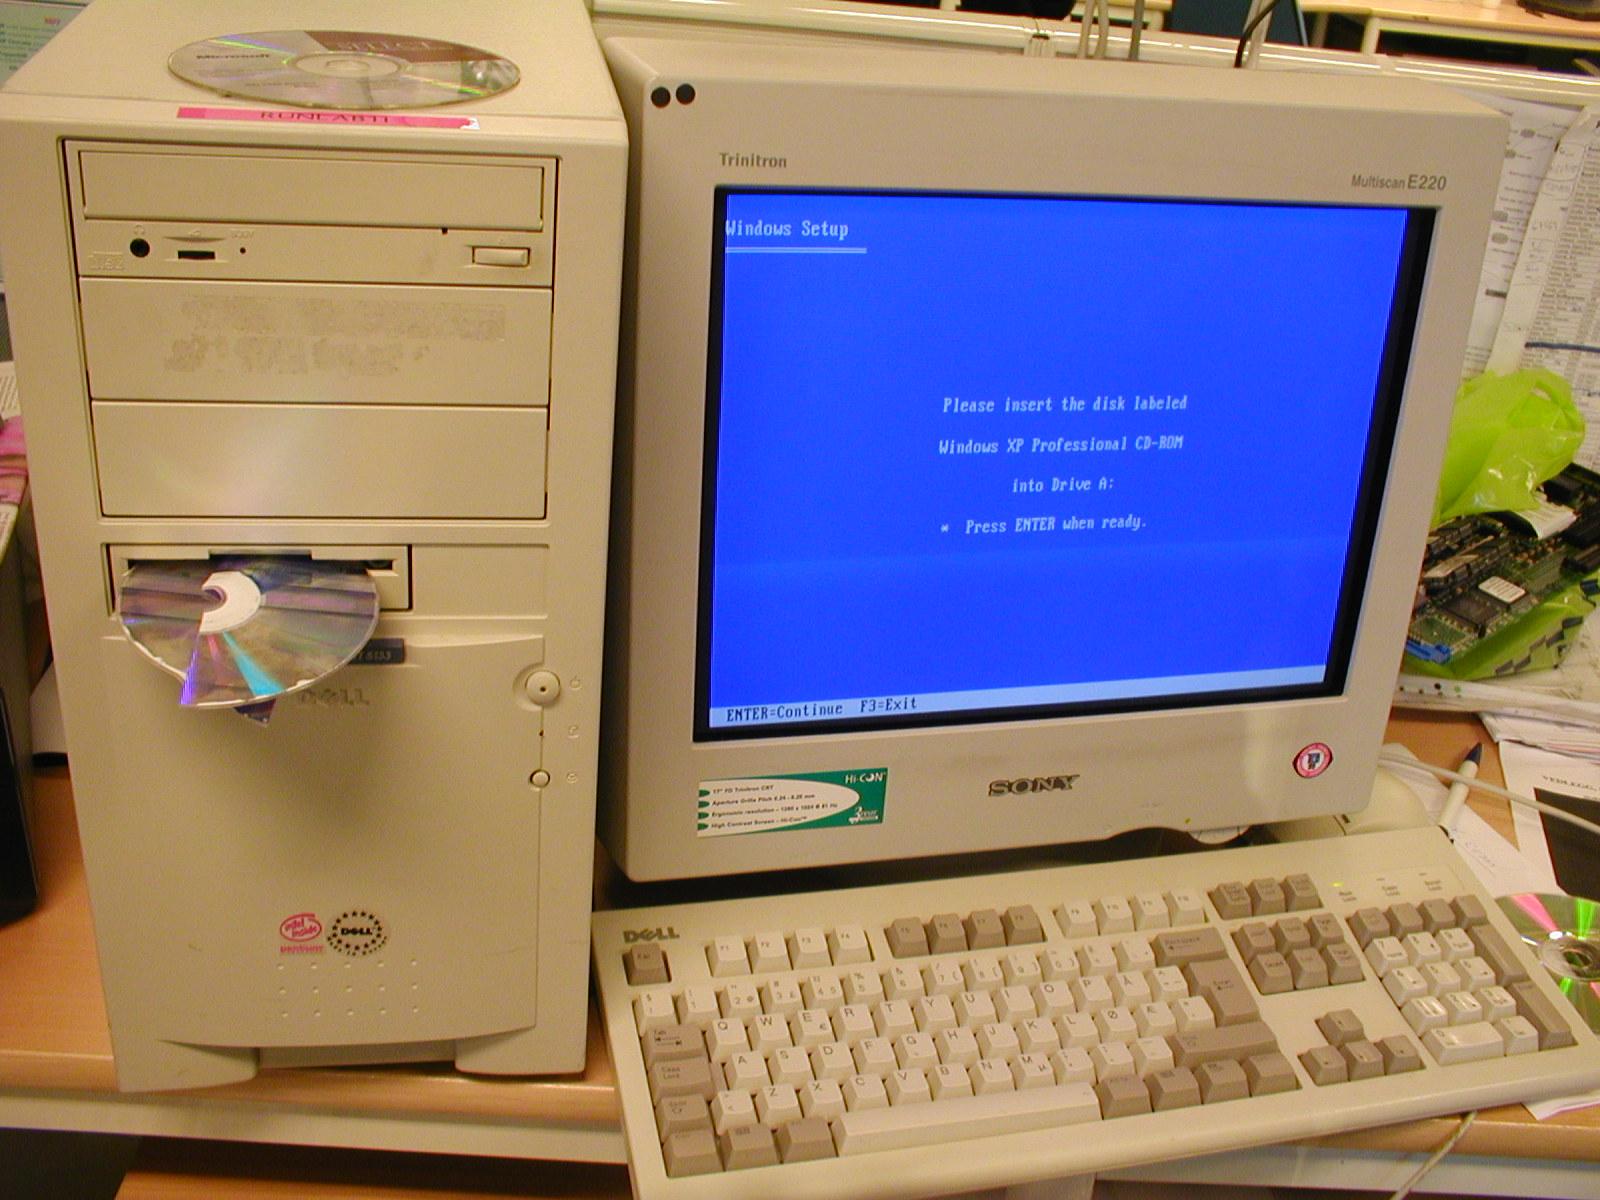 insert-disk-drive-a.jpg